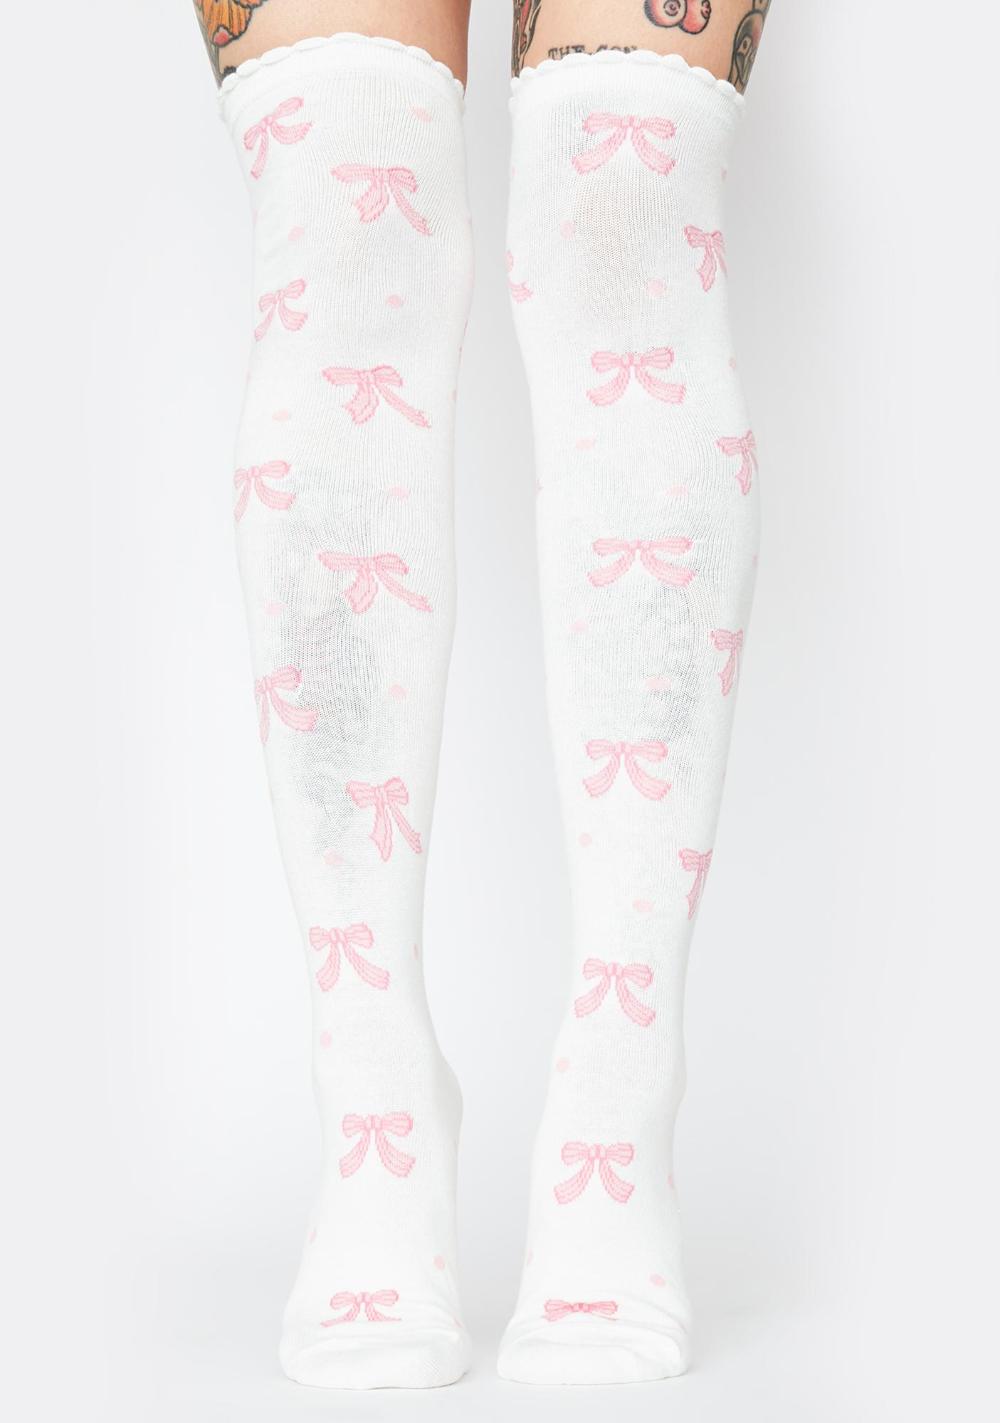 Details about  /Lolita Ribbon Stockings Harajuku Japanese Kawaii Accessory Cute Knee High Socks